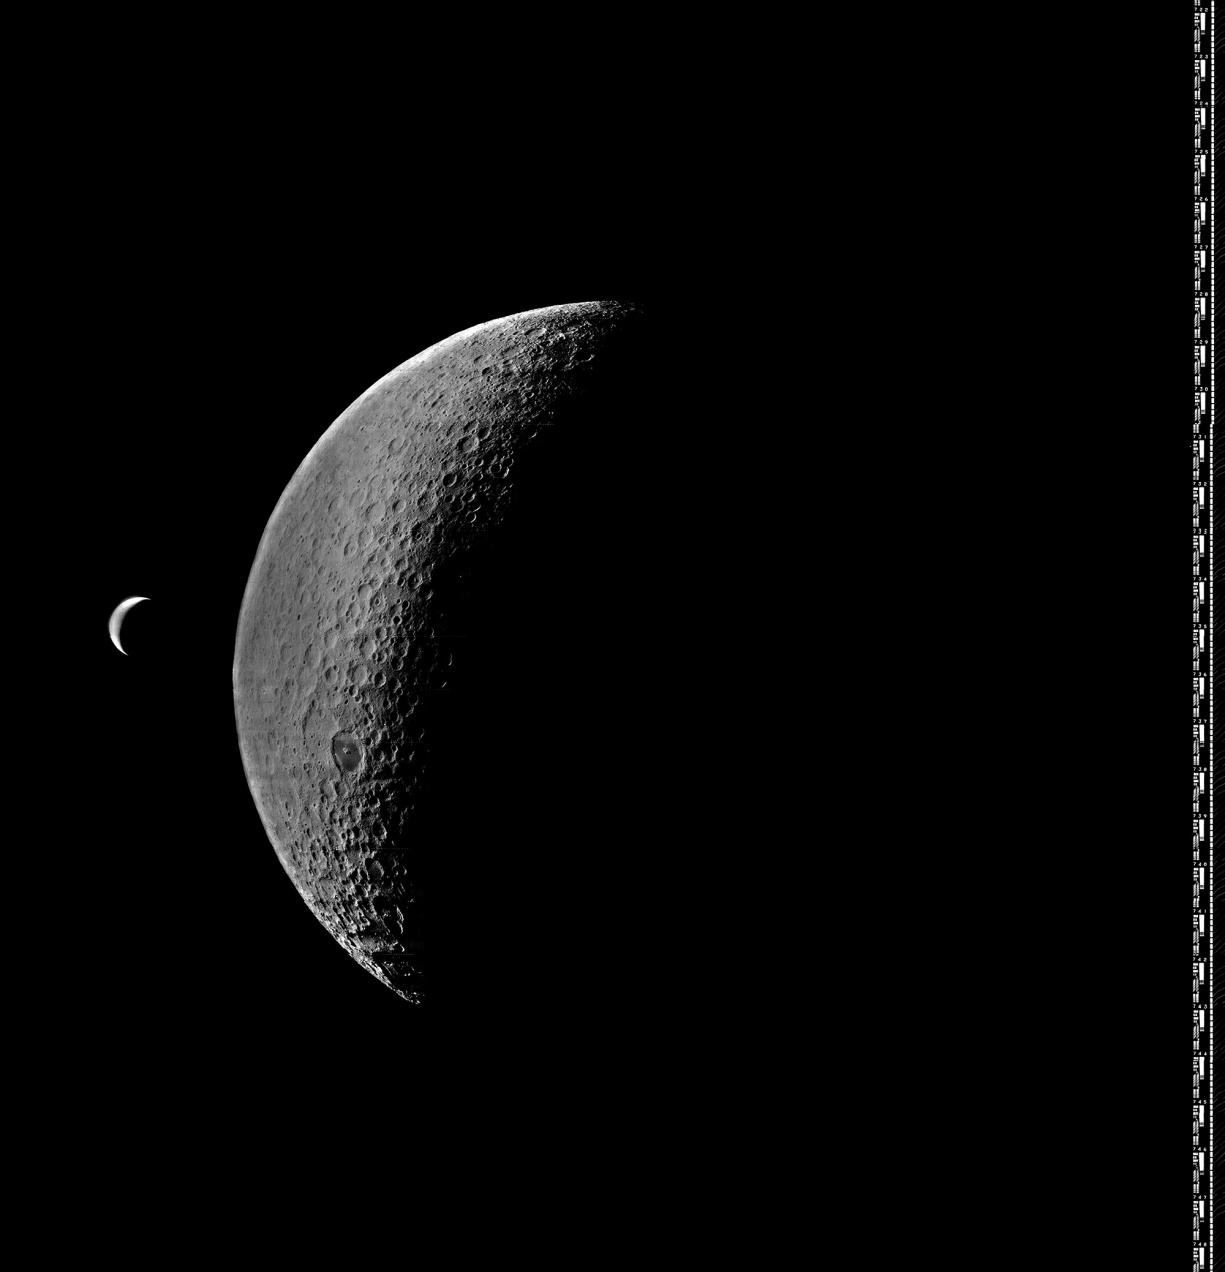 Lunar Orbiter IV